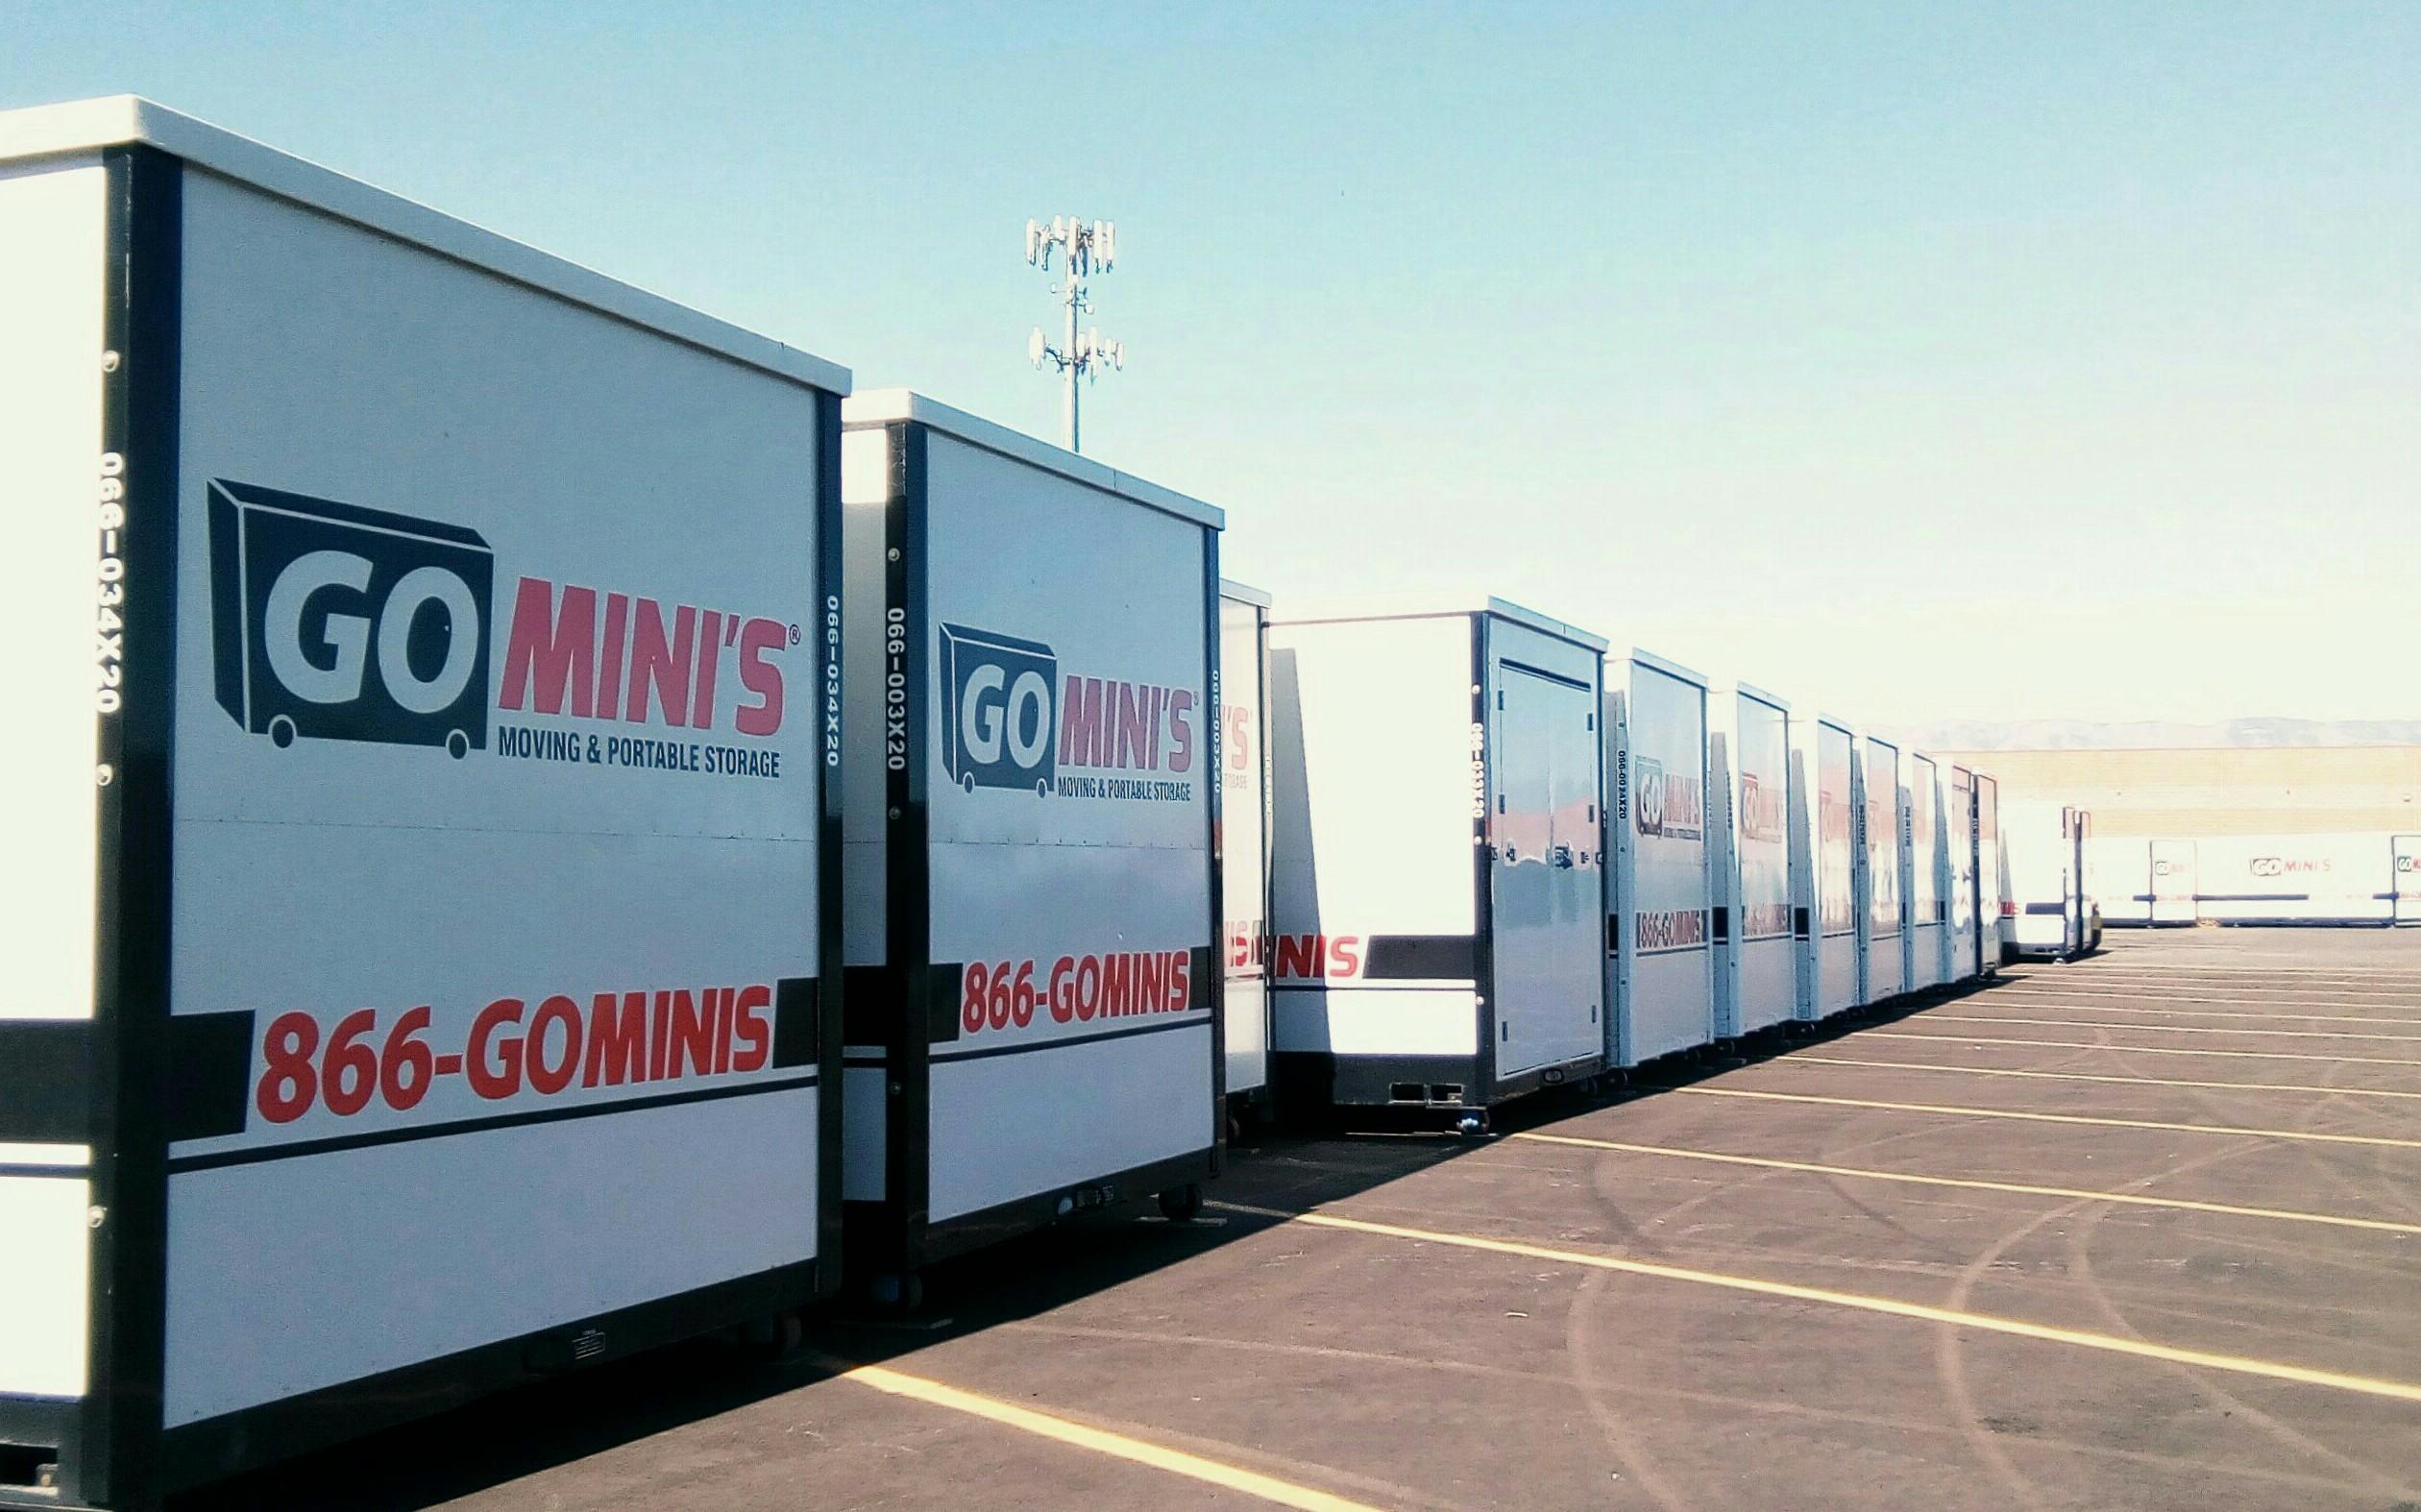 Go Mini's Moving & Portable Storage image 84